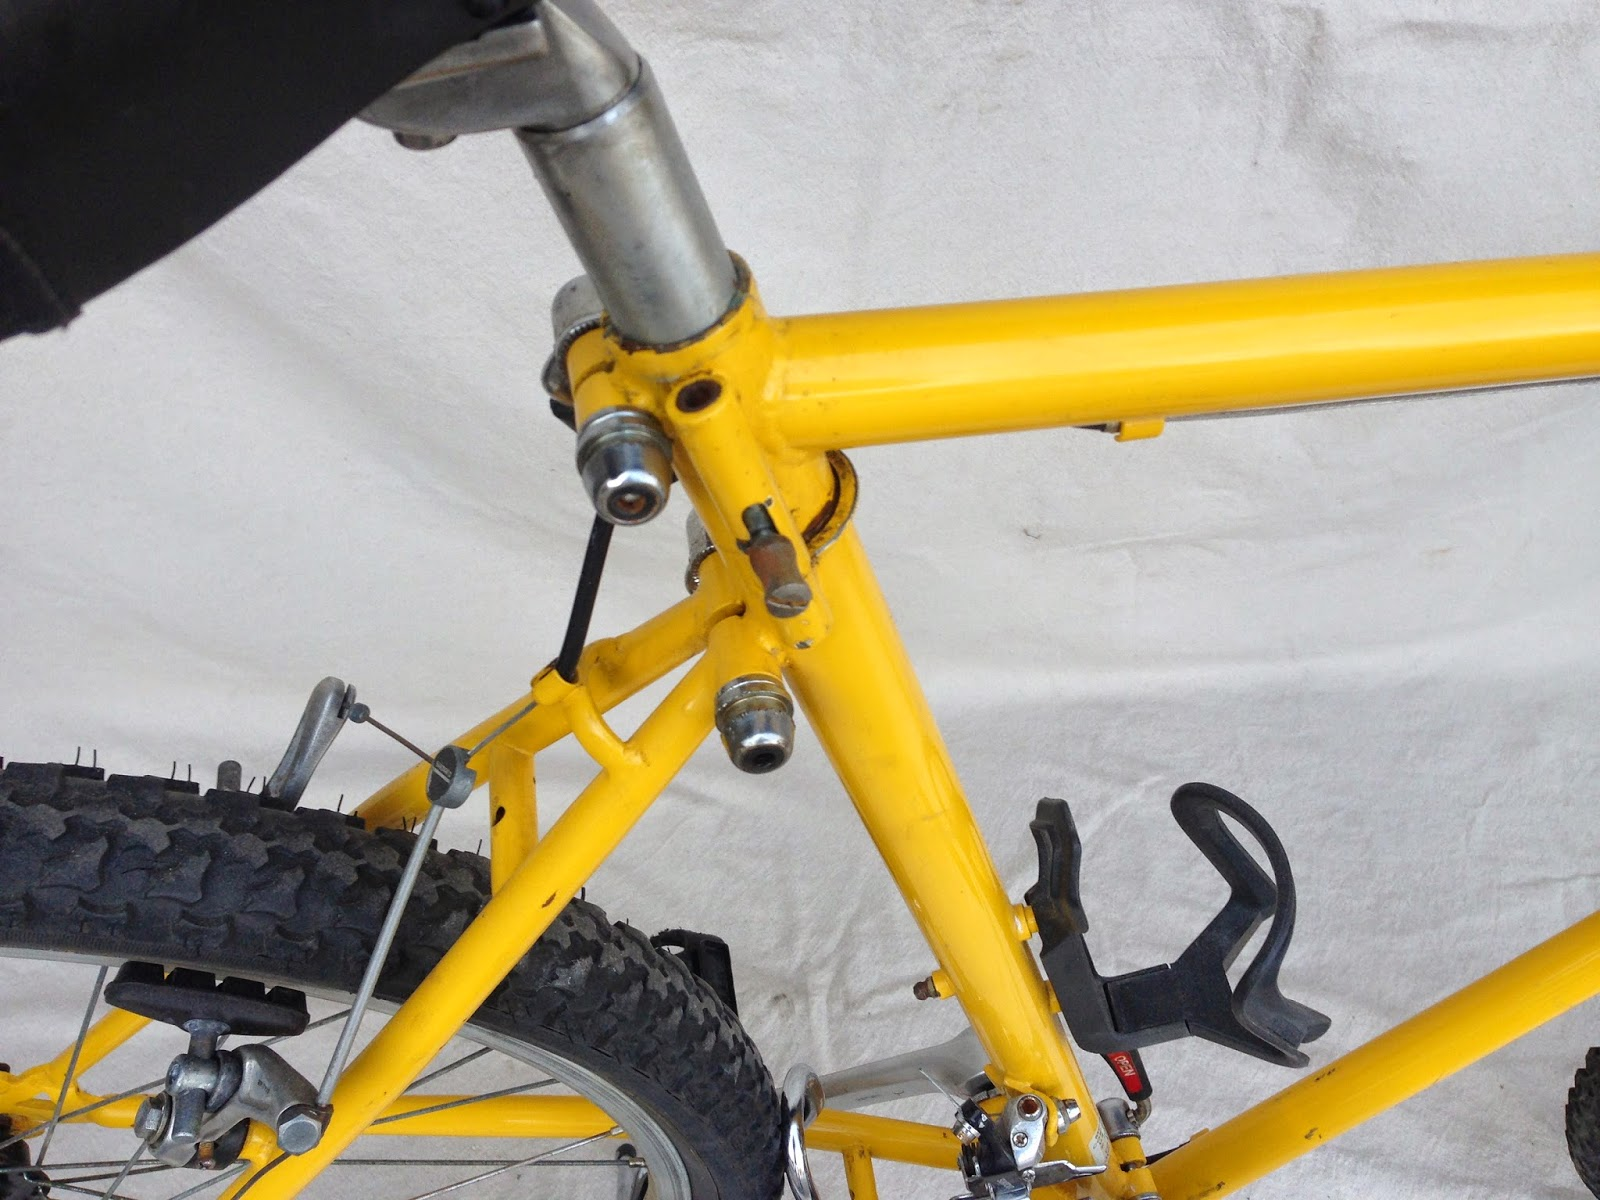 1996 Bmw Montague Folding Mountain Bike Whistle Bike